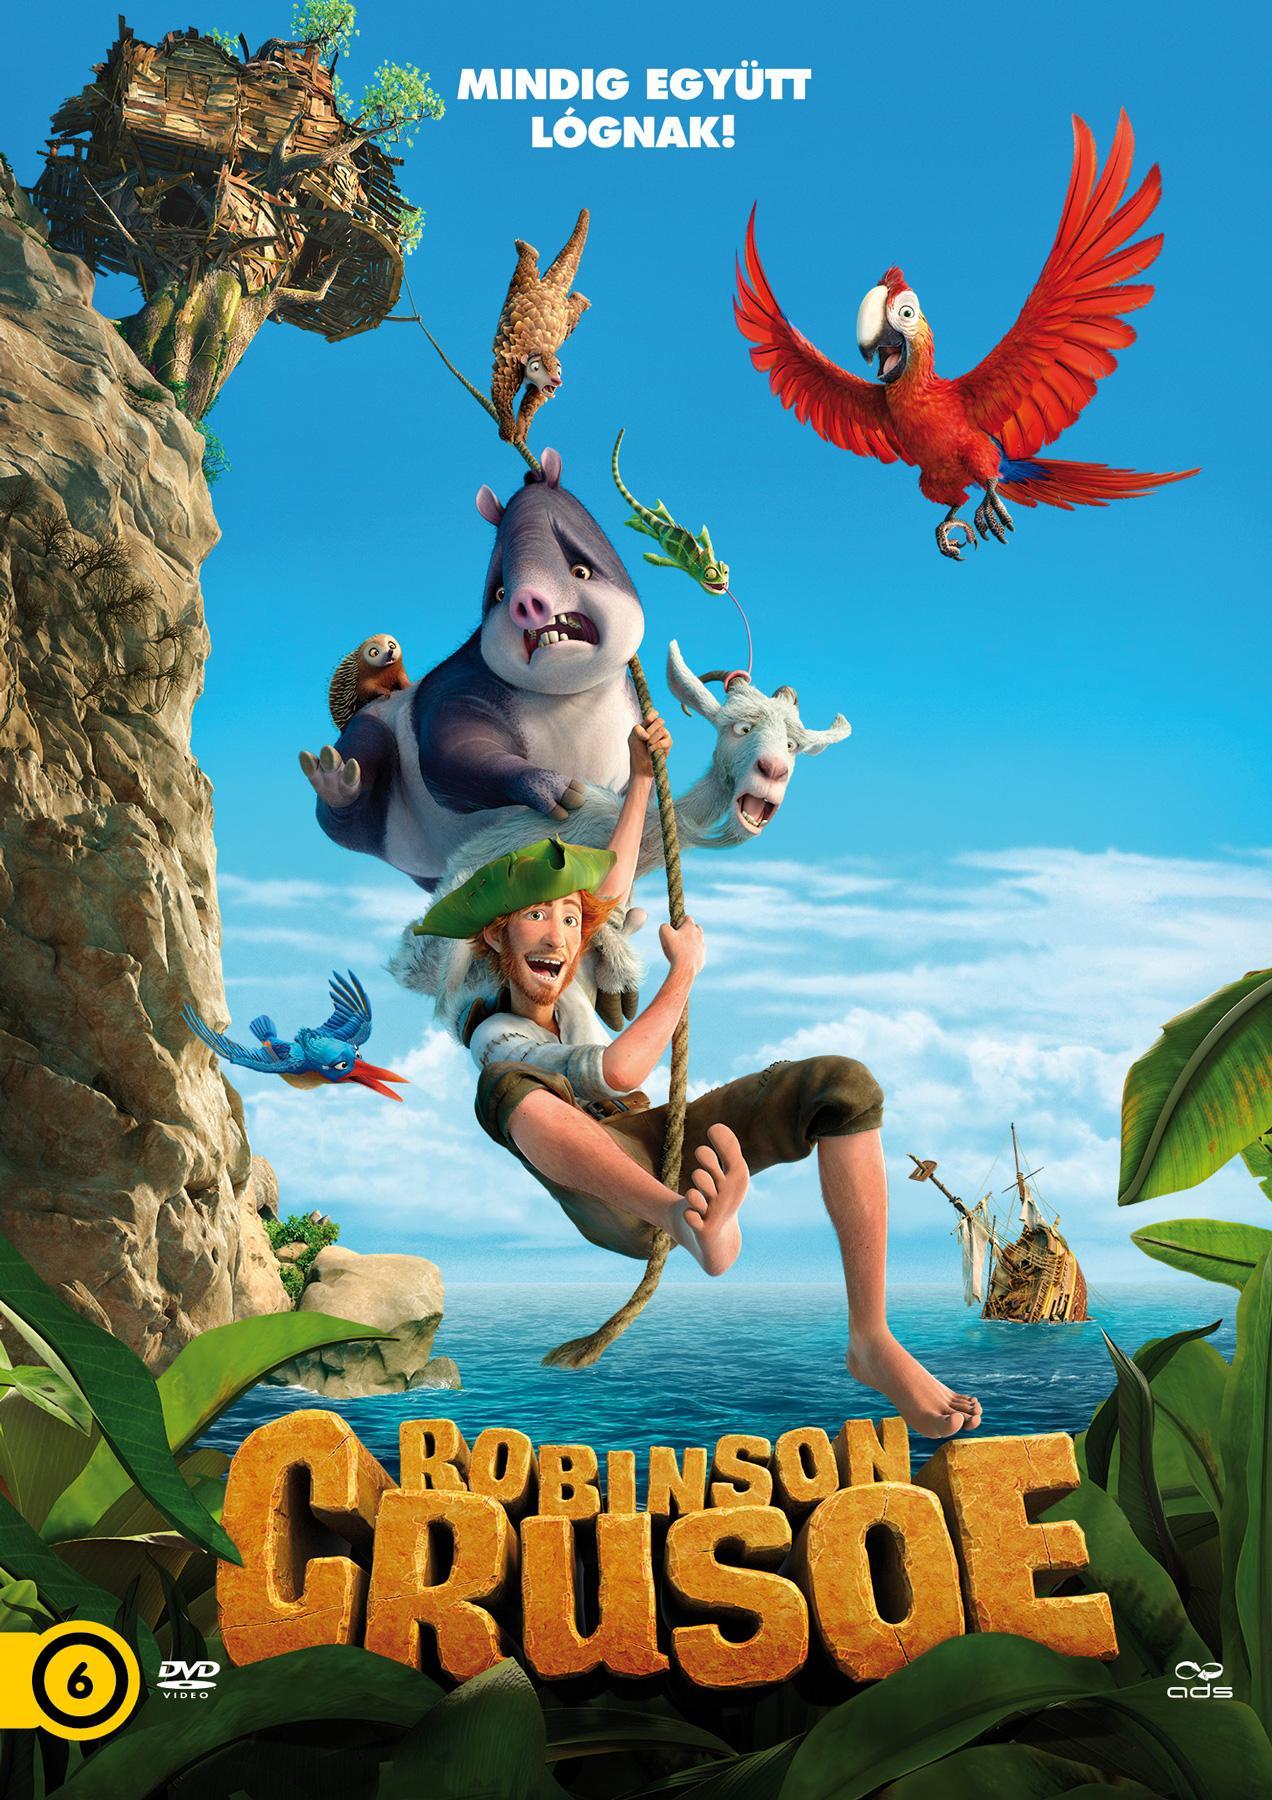 - ROBINSON CRUSOE - DVD -